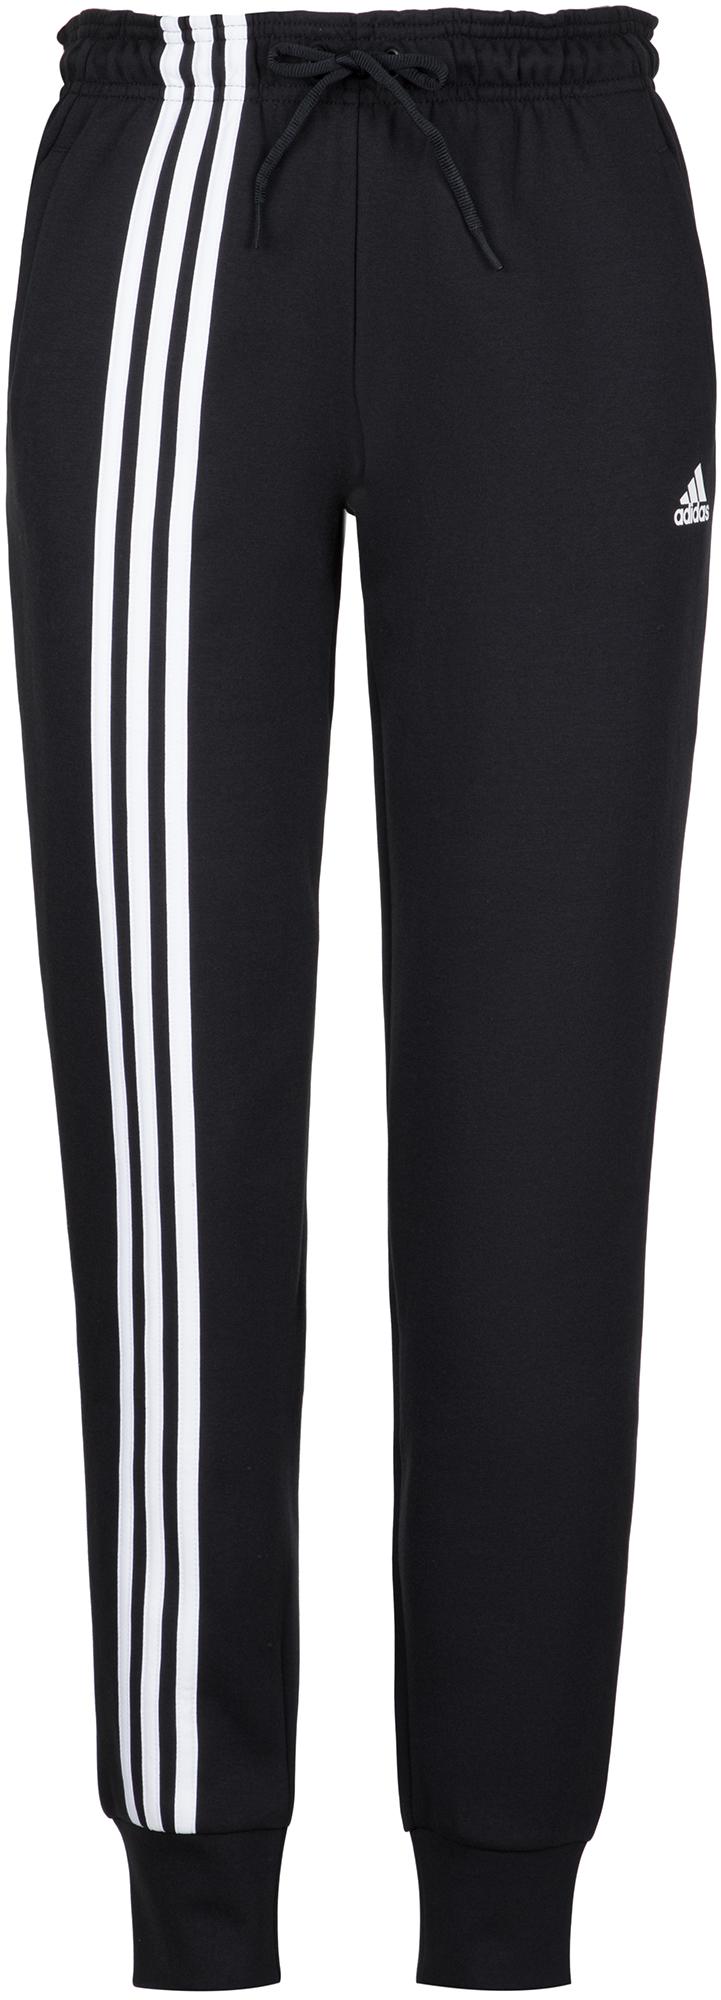 Adidas Брюки женские adidas, размер 42-44 тайтсы женские adidas how we do tight цвет серый dp3958 размер xs 40 42